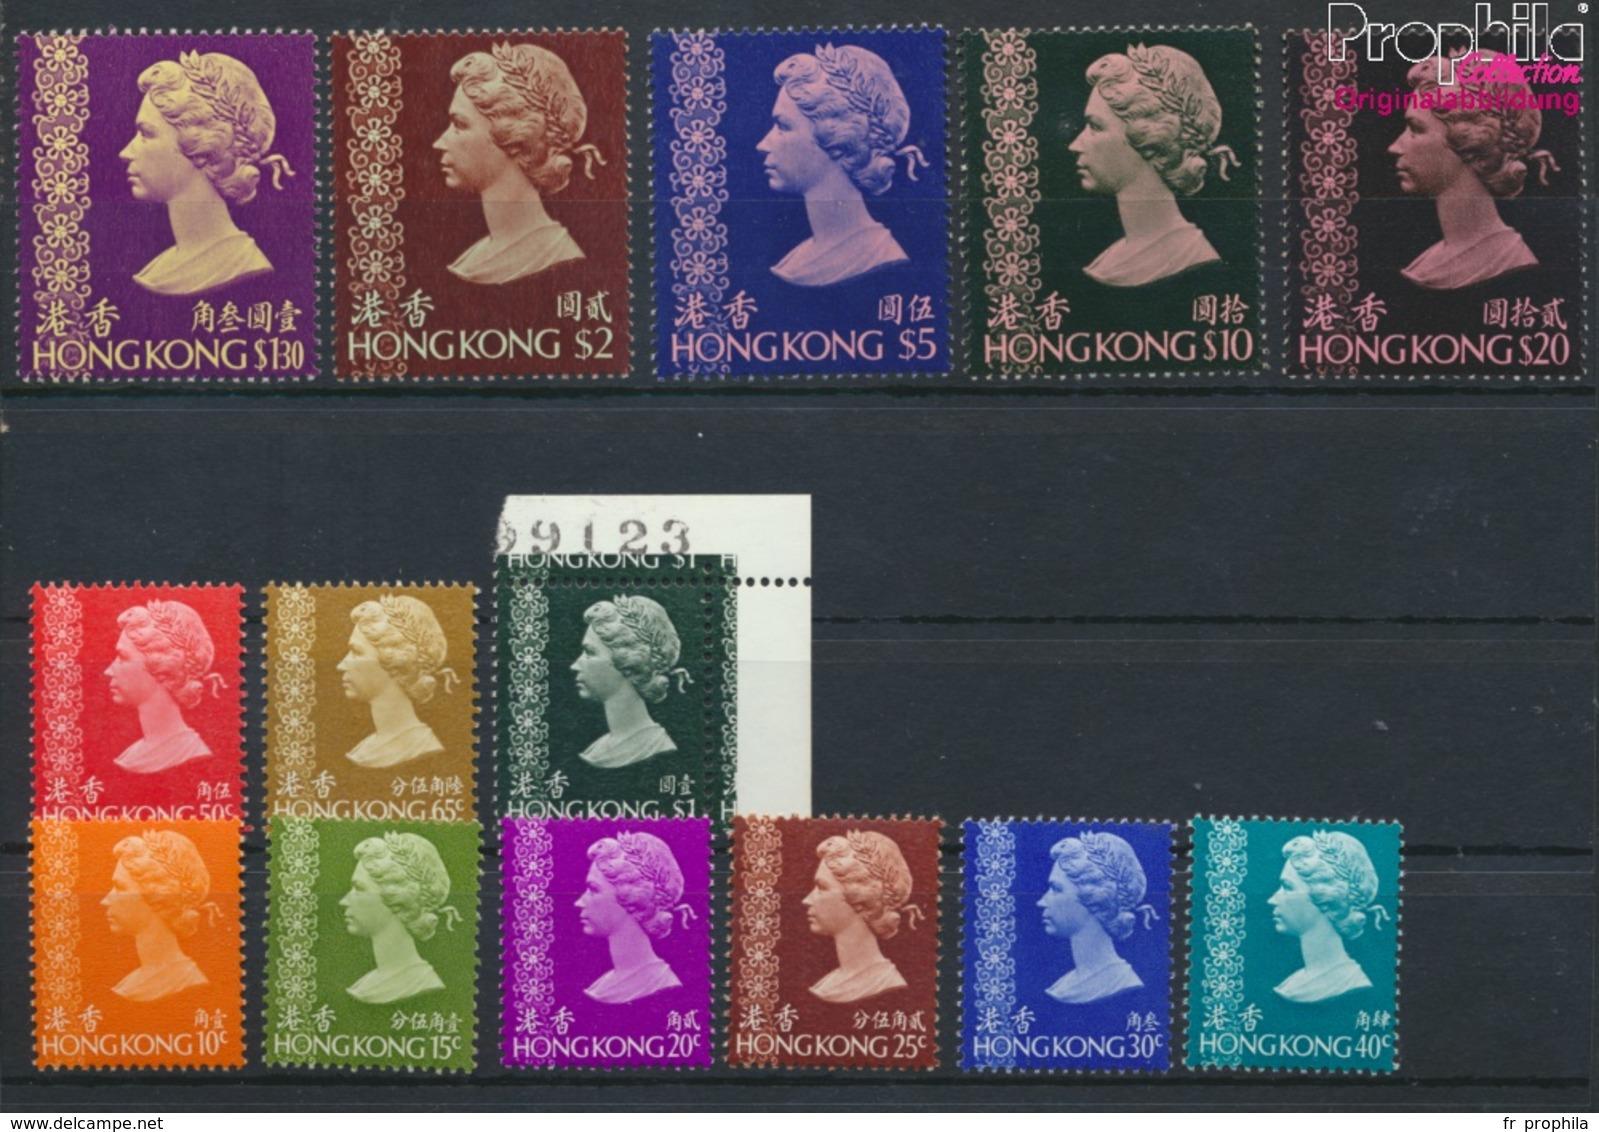 Hong Kong 295-305 (complète.Edition.) Neuf Avec Gomme Originale 1975 Queen Elizabeth Ii. (9349793 (9349793 - Hong Kong (...-1997)